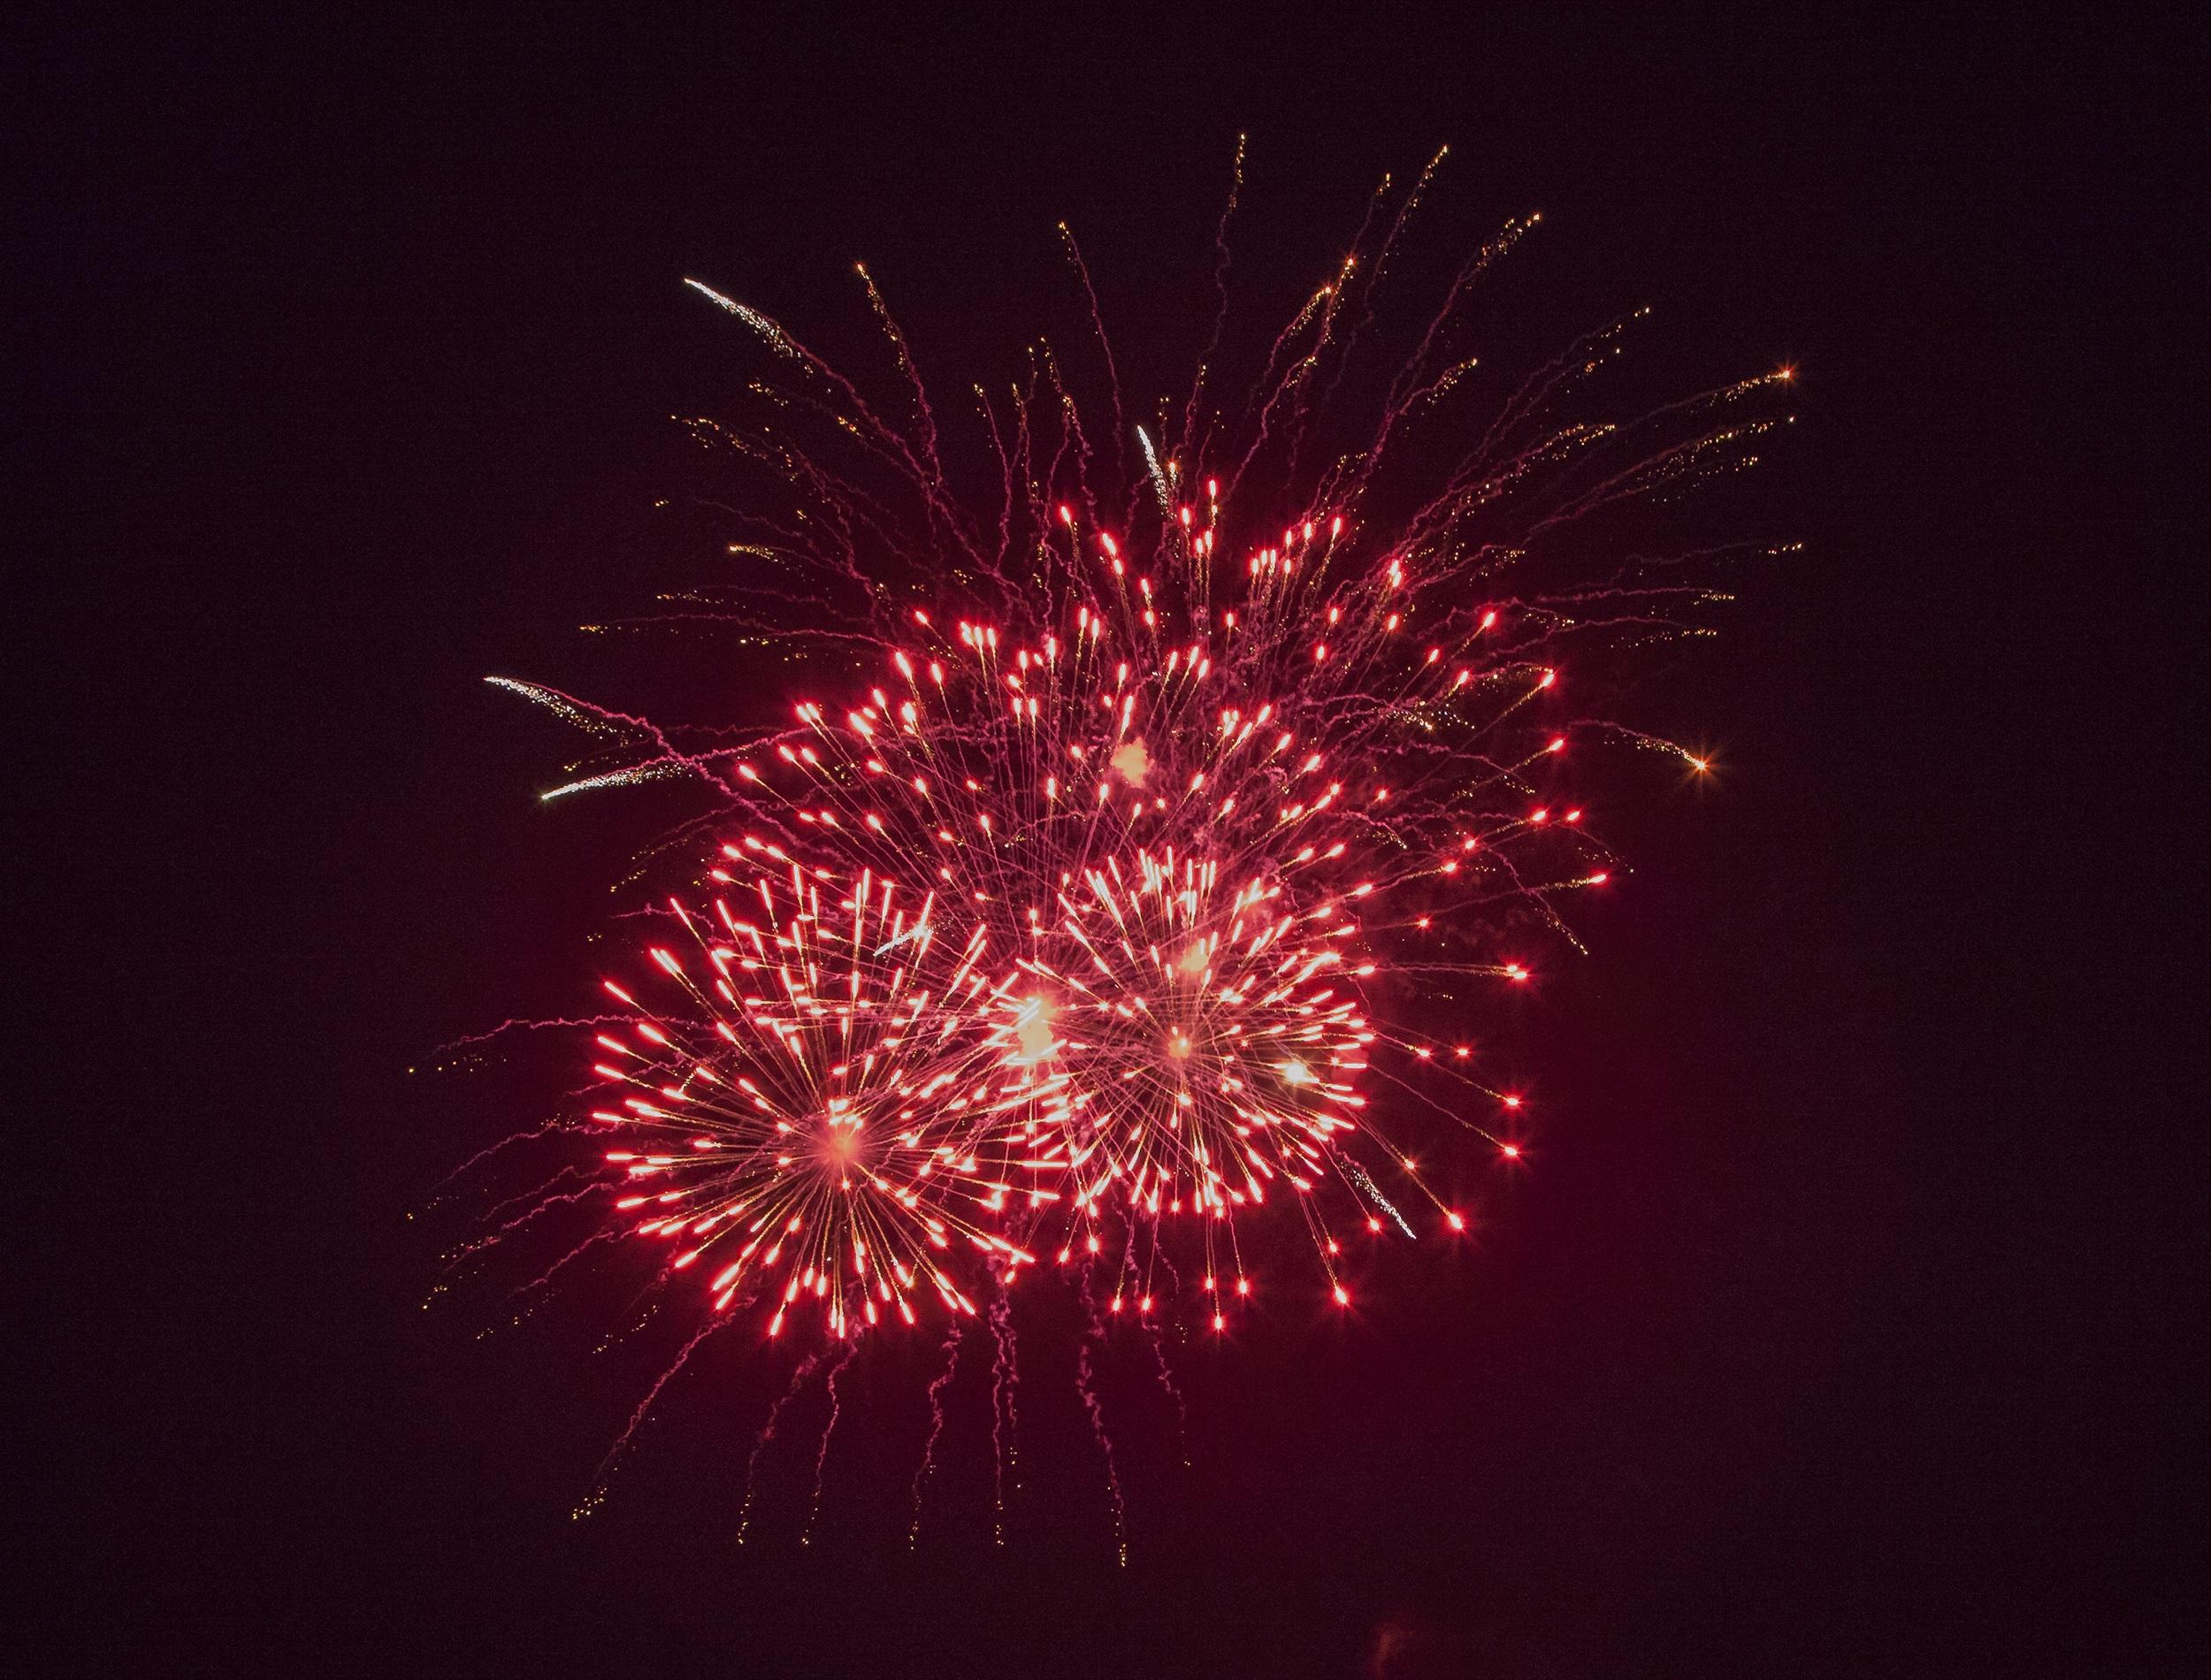 Gambar langit rekreasi kilau merah kegelapan hitam tahun gambar langit rekreasi kilau merah kegelapan hitam tahun baru festival kembang api pesta peristiwa tengah malam diwali malam tahun baru voltagebd Images